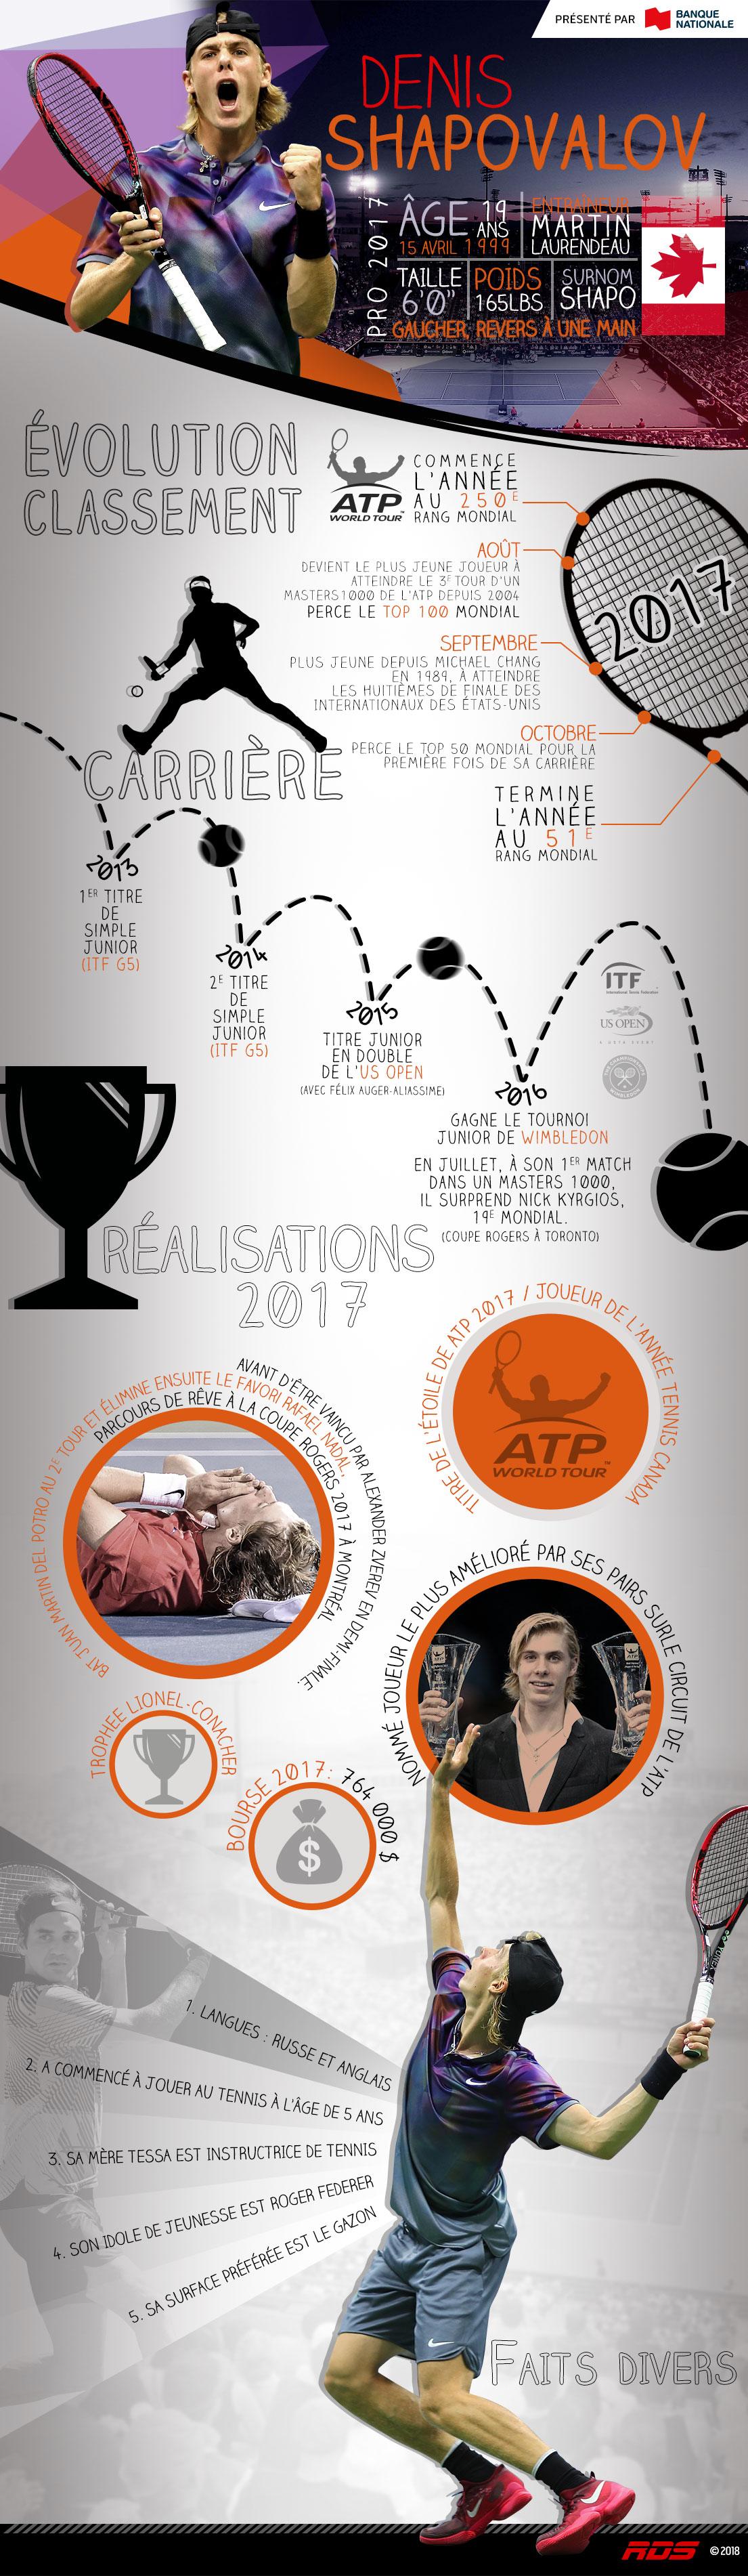 Infographie Denis Shapovalov